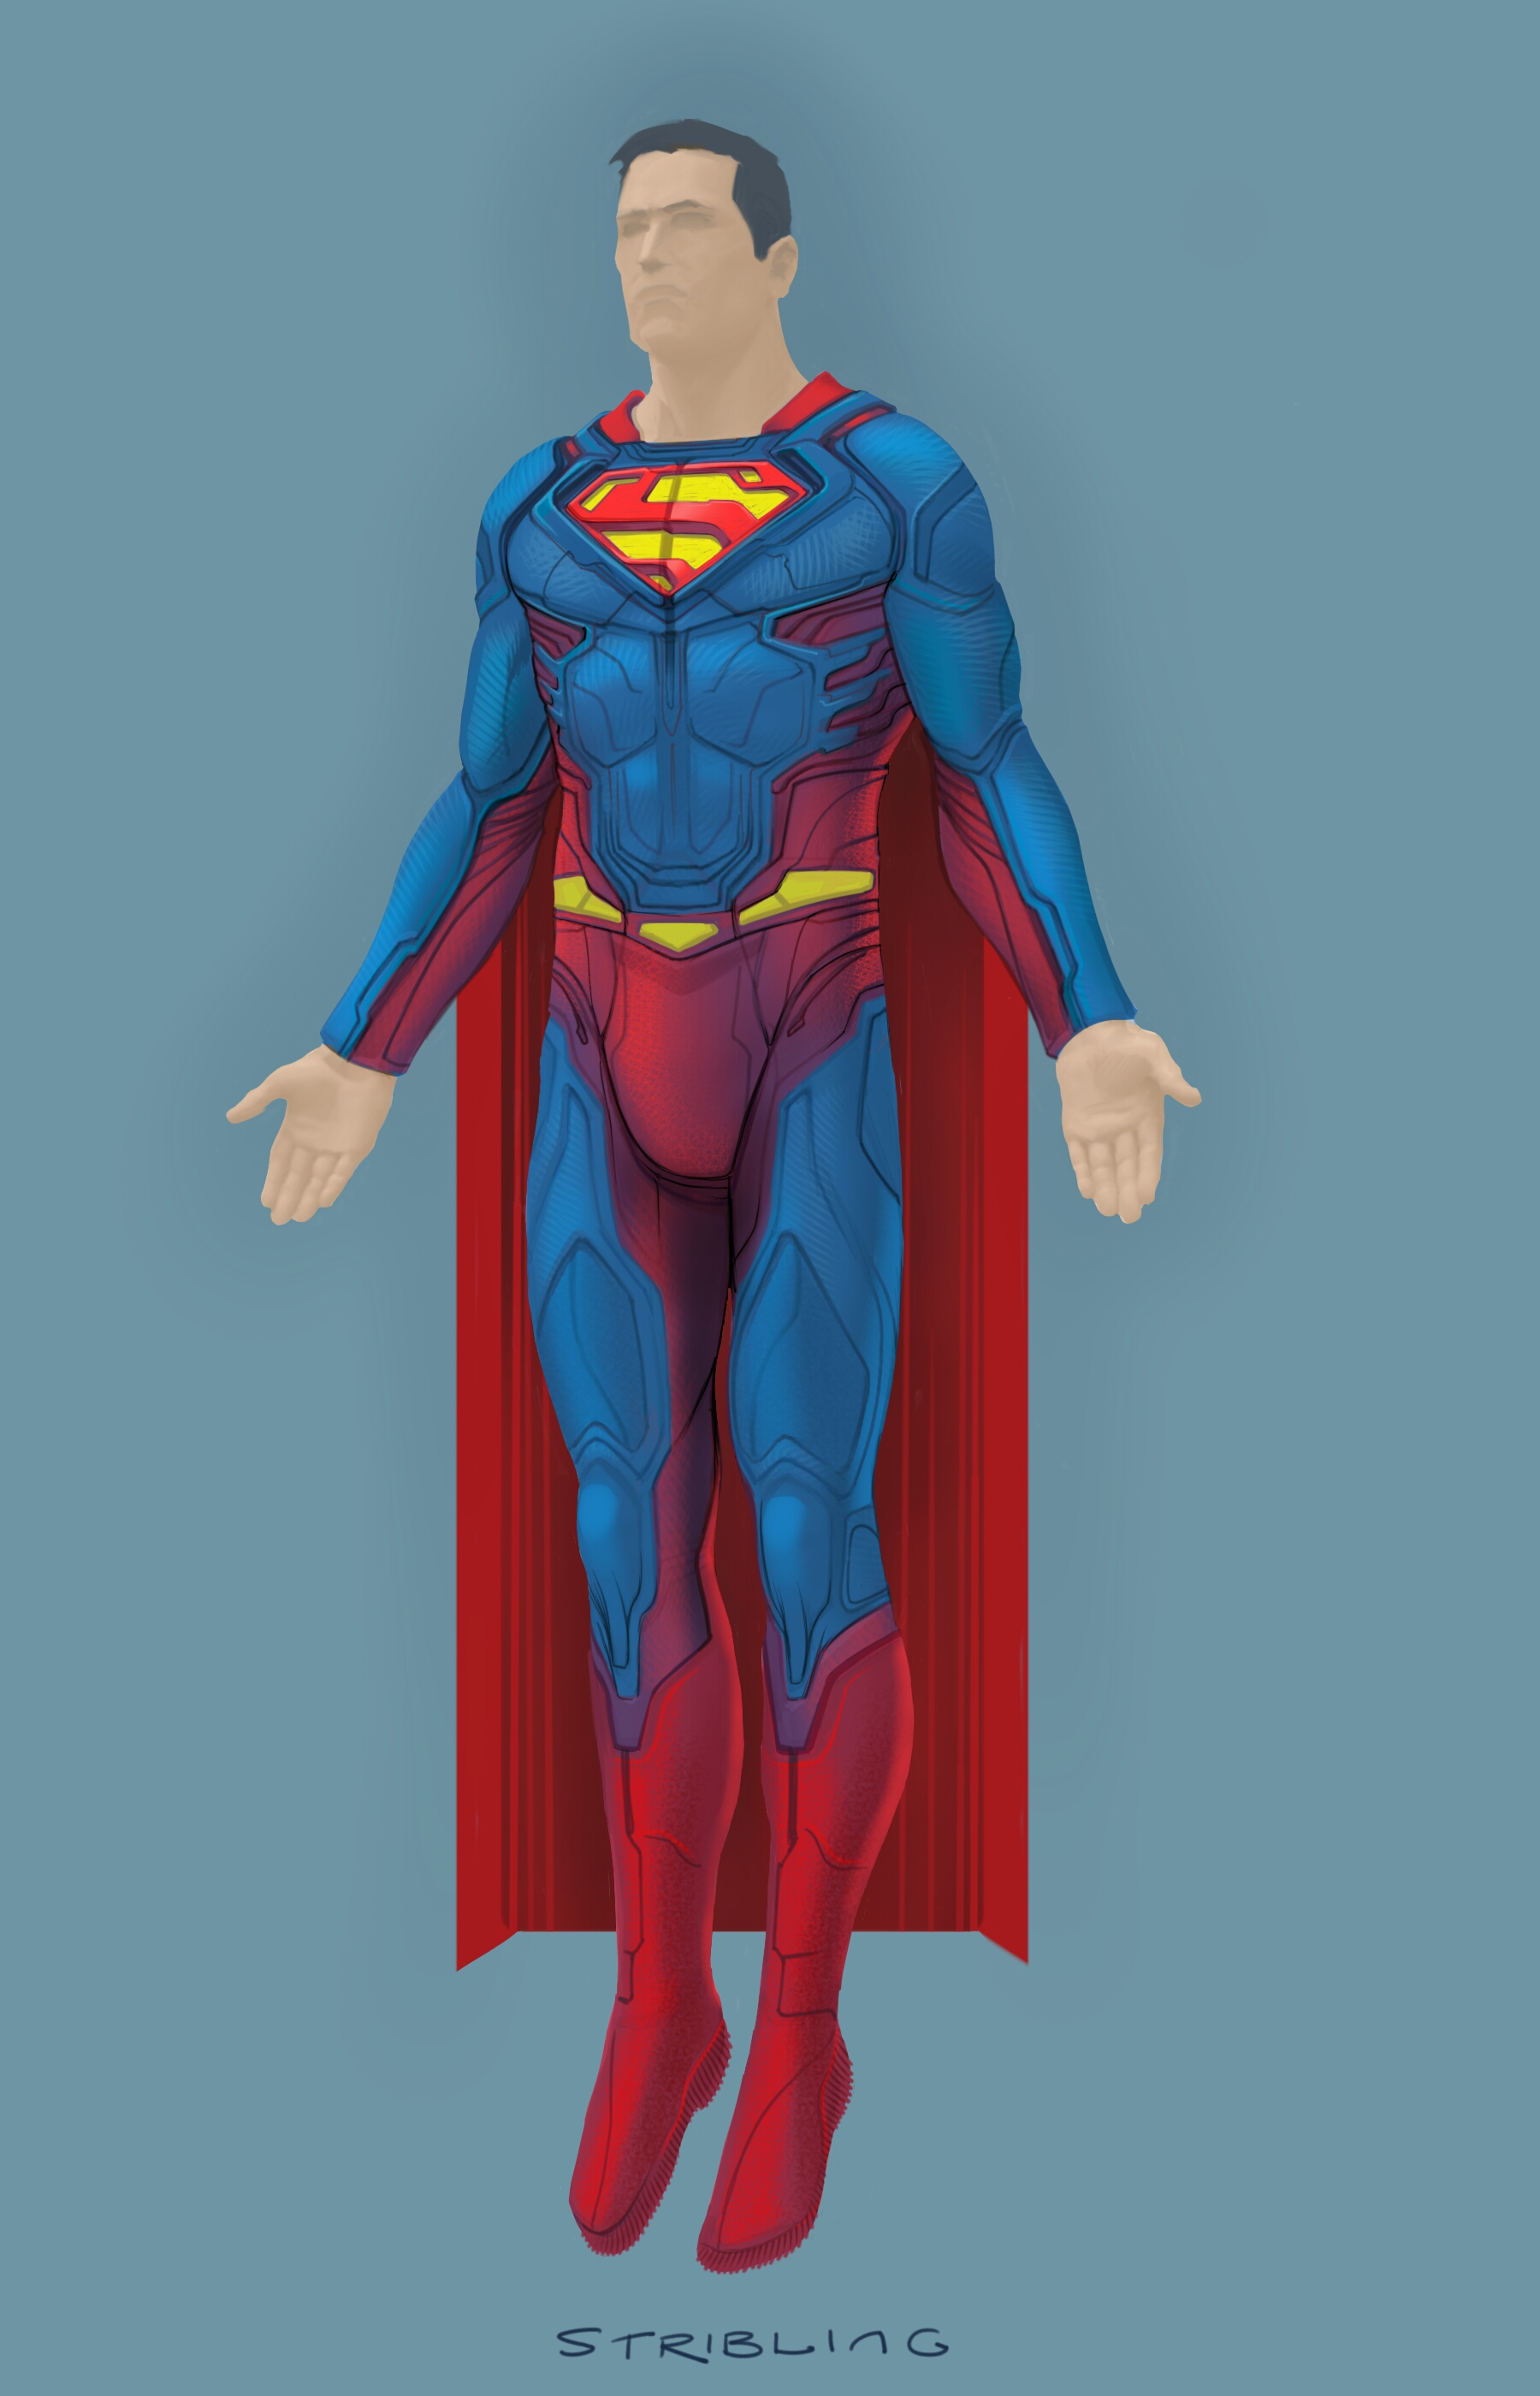 Super costume by strib